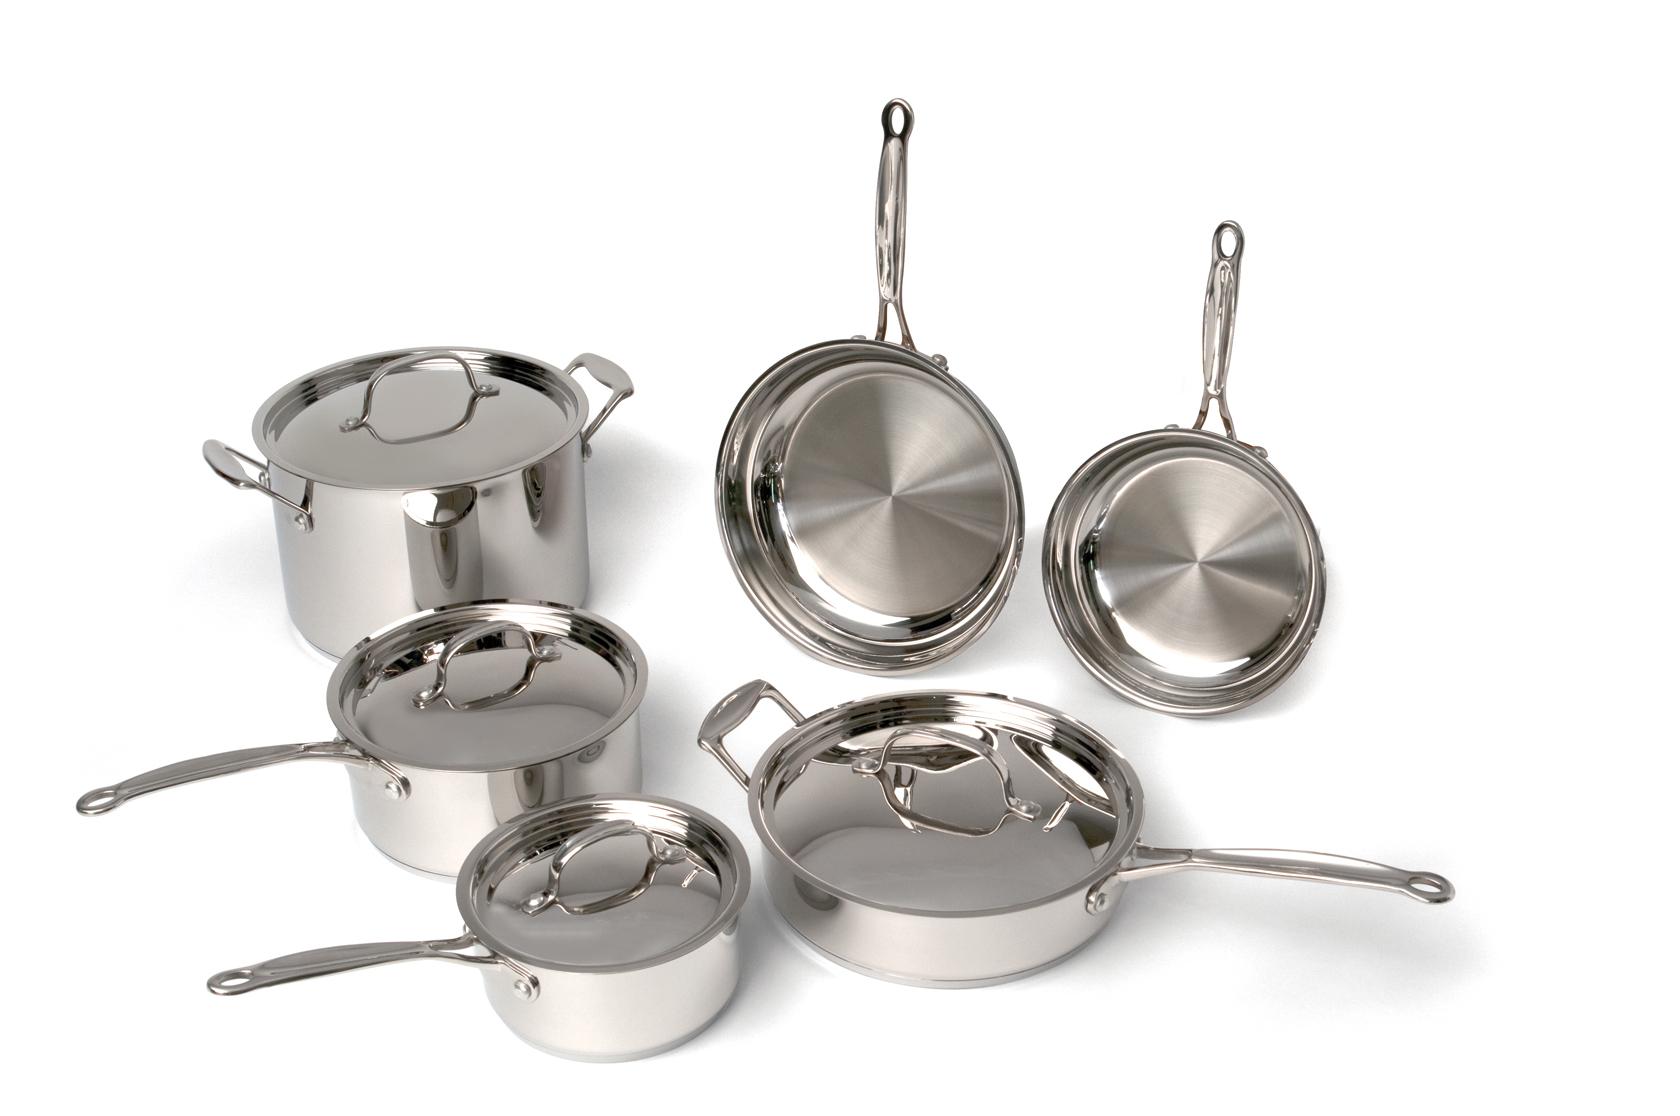 EarthChef Premium Copper Clad 10pc Cookware Set